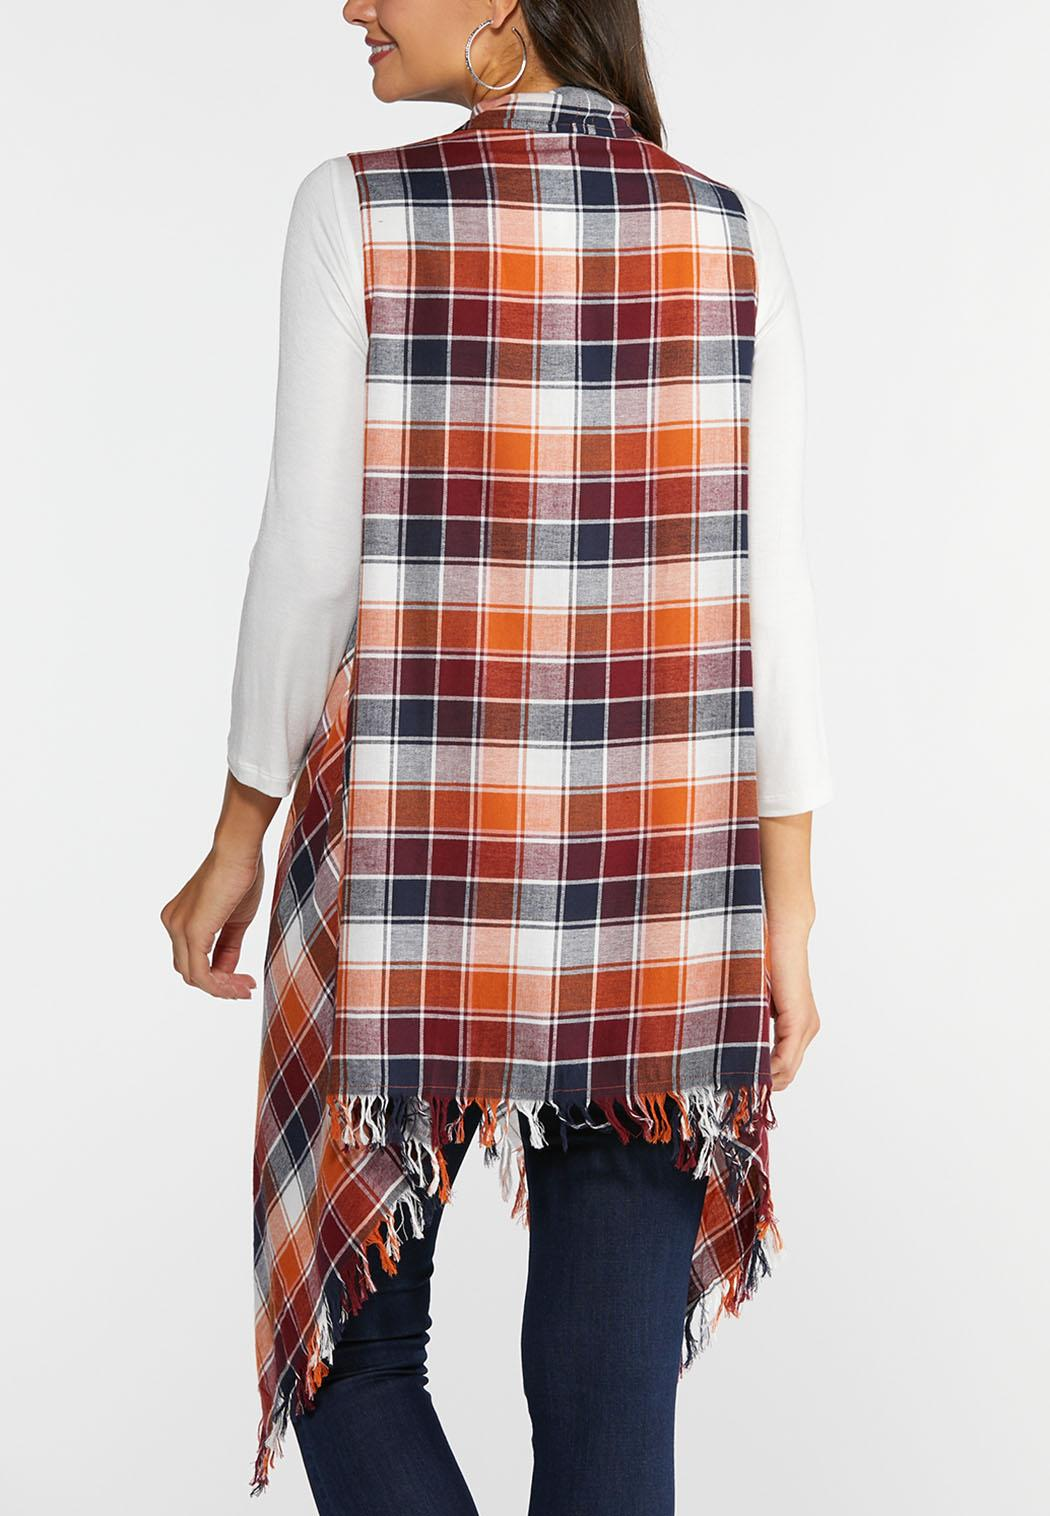 Frayed Plaid Vest (Item #43927444)